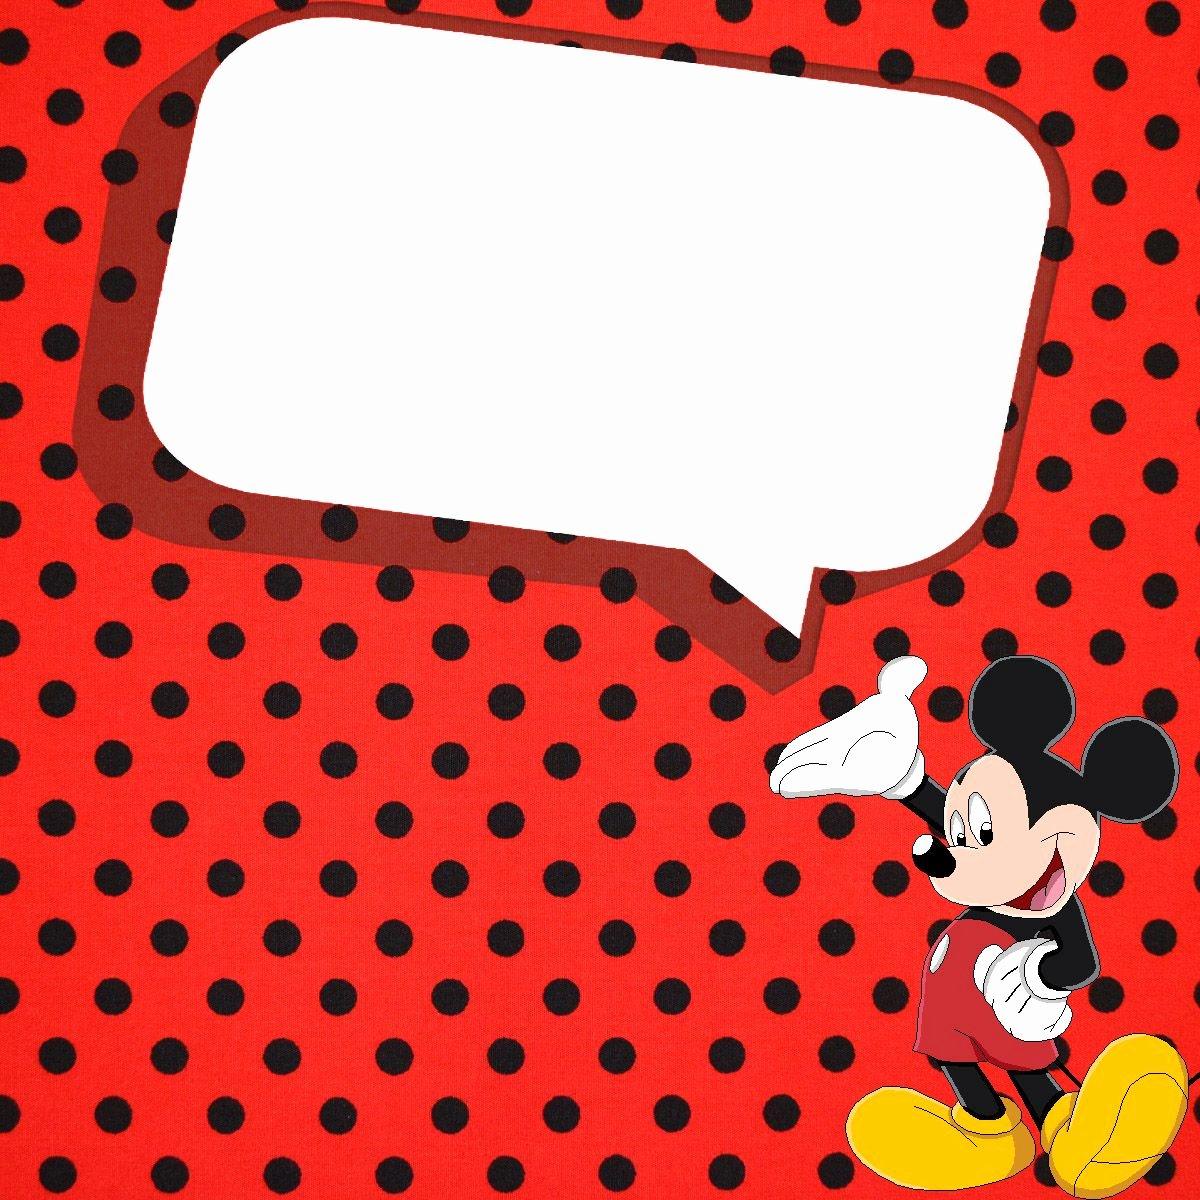 Mickey Mouse Birthday Invitation Template Fresh Free Printable Invitation Templates